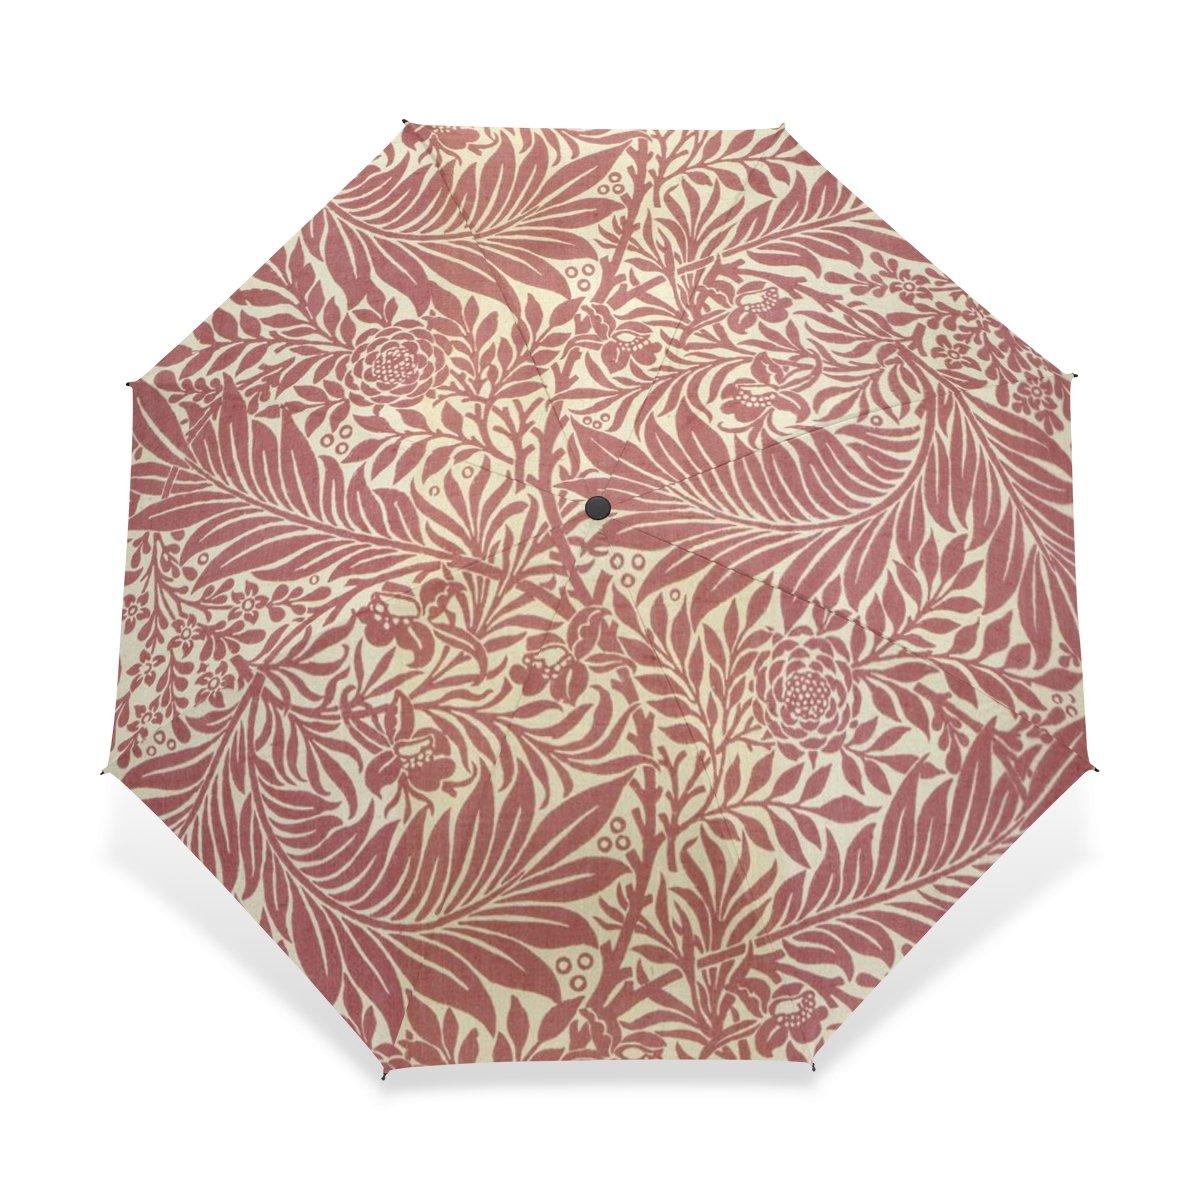 baihuishop防風ゴルフ傘、コンパクトで旅行for Easy Carryingスポーツ雨傘 – 強力なフレームUnbreakable William Morris印刷パターン   B01G3I8KZ4